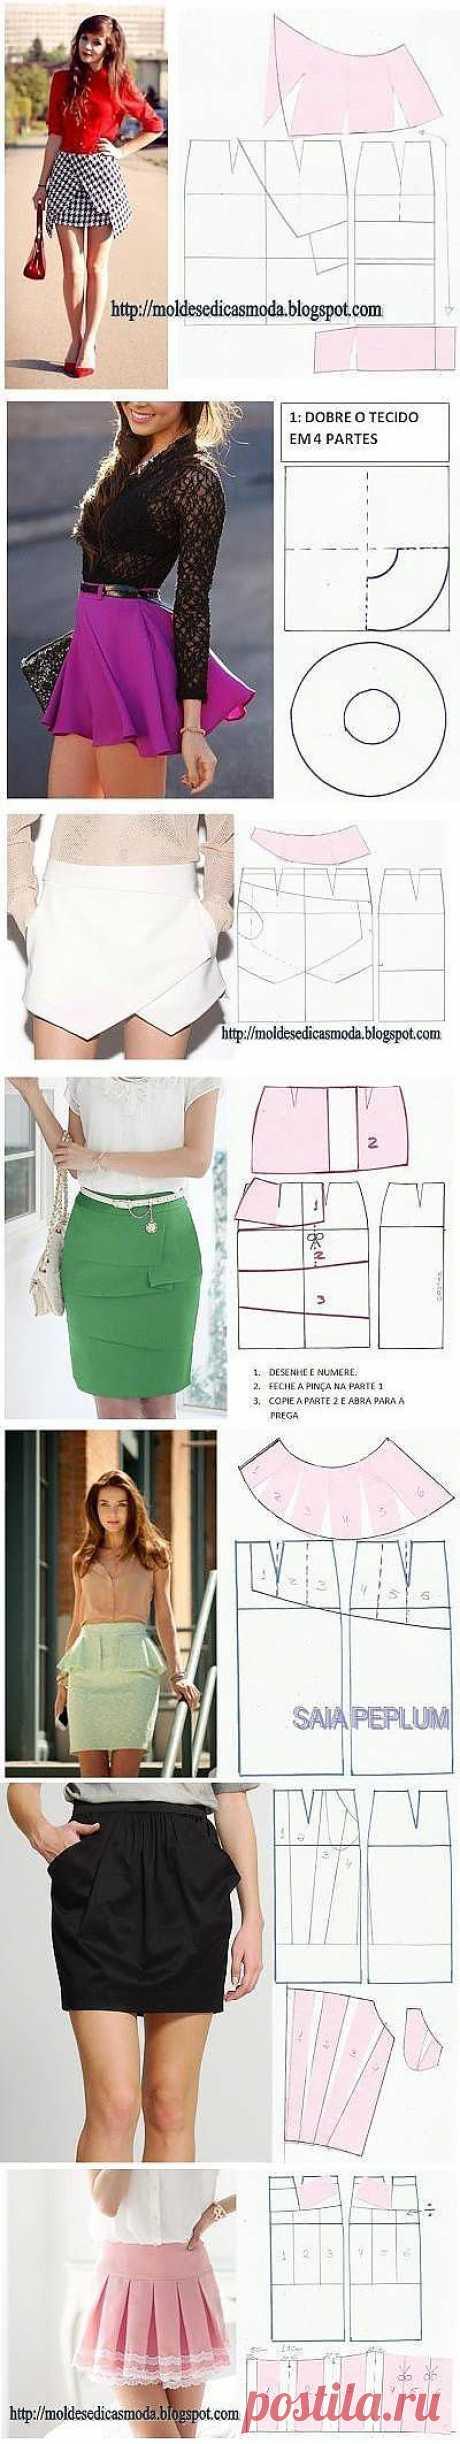 DIY Stylish Skirts DIY Projects | UsefulDIY.com